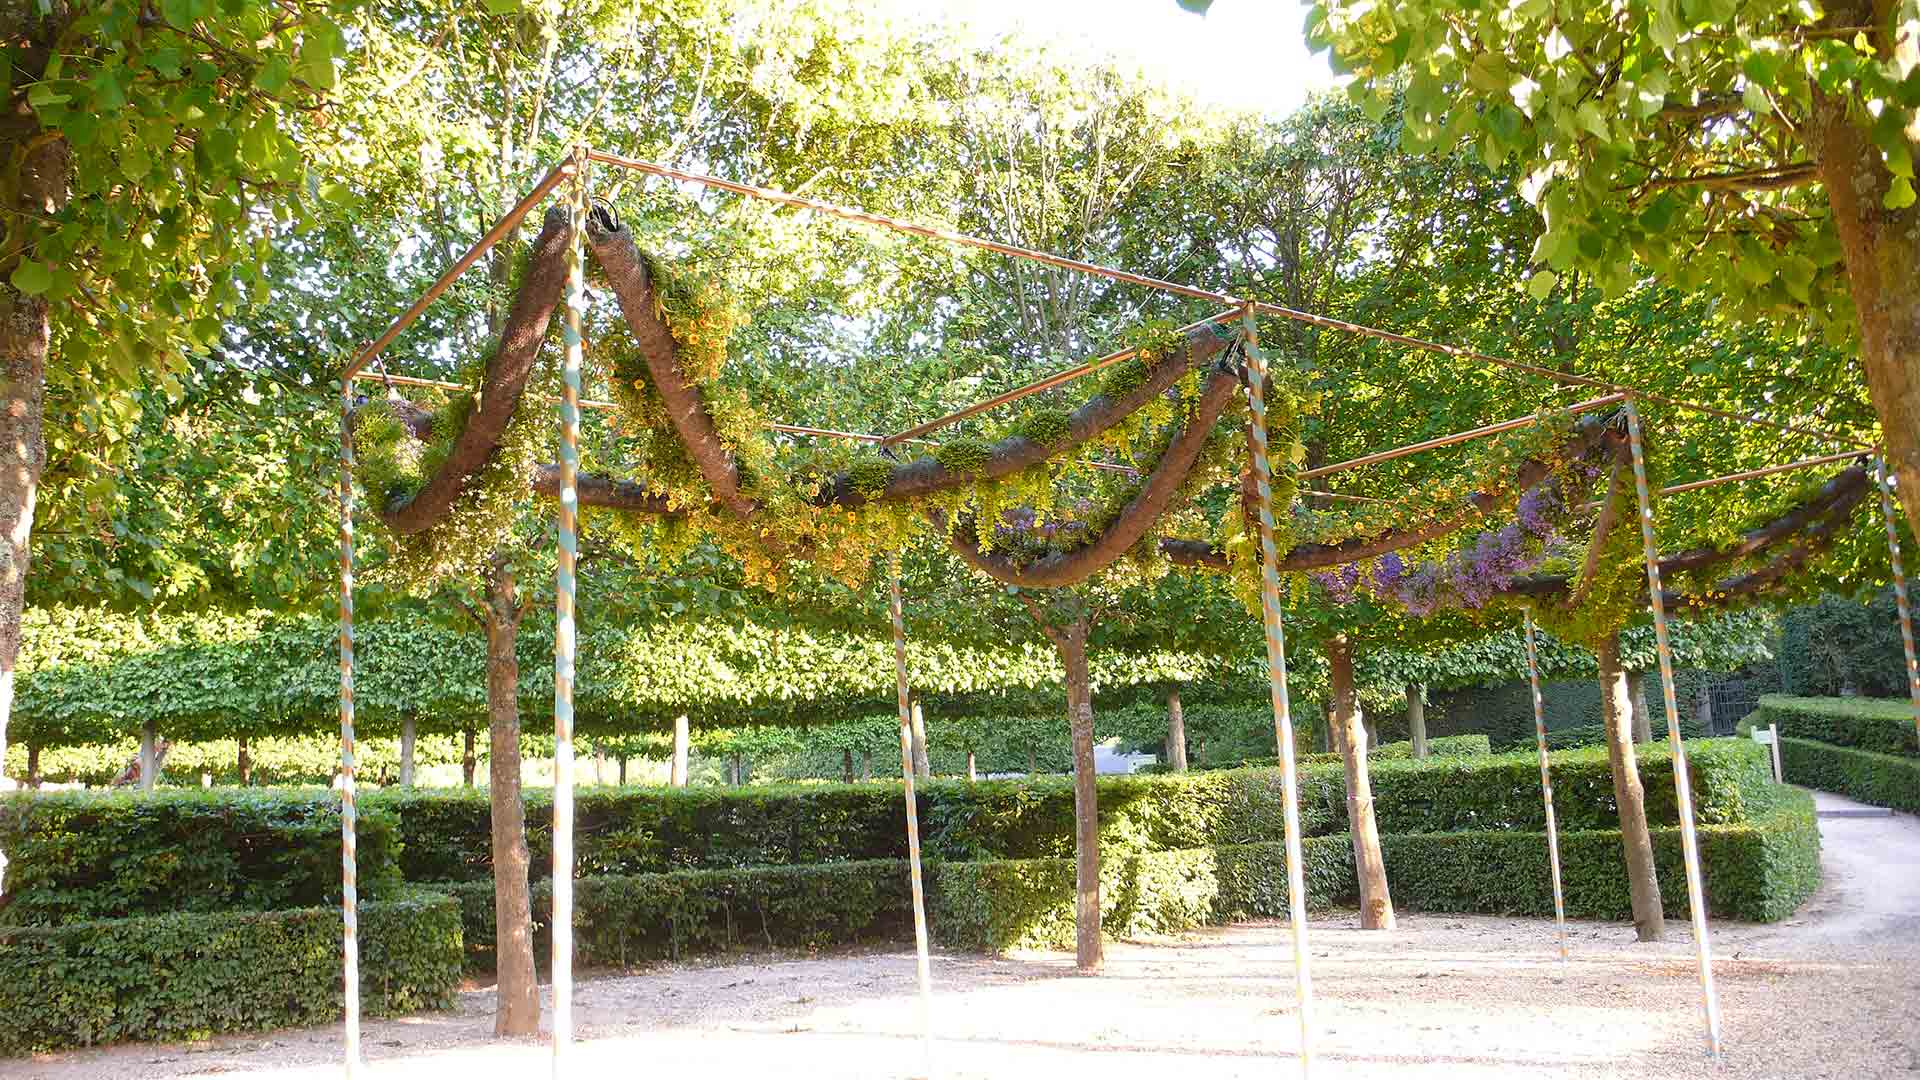 04 Alexis tricoire versailles galeries vegetales